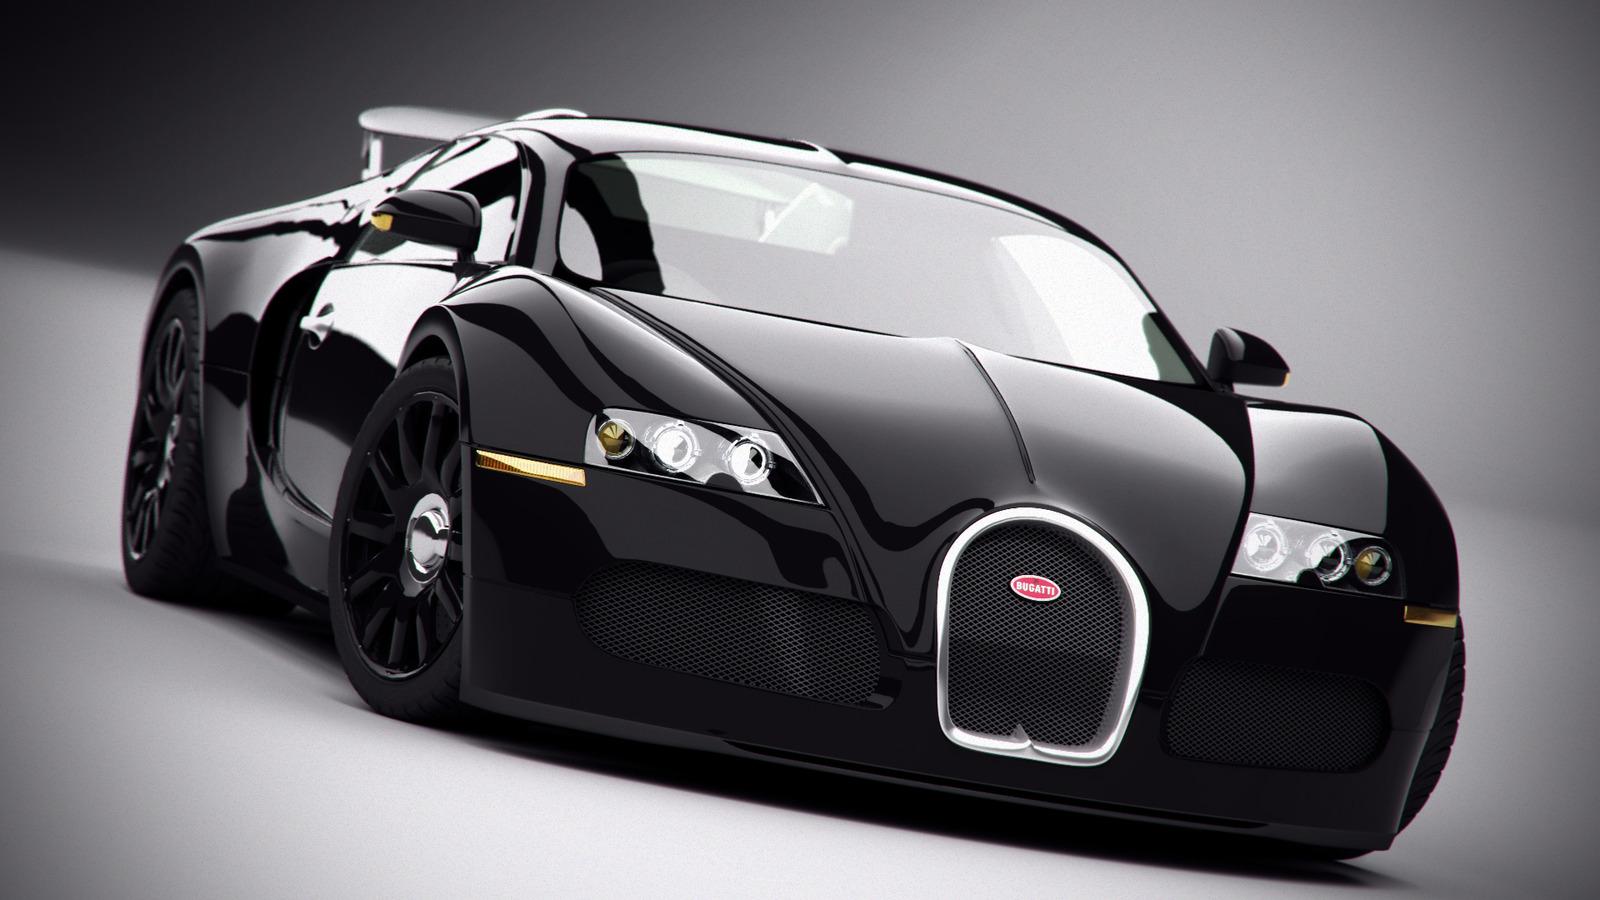 Bugatti Car Hd Wallpaper